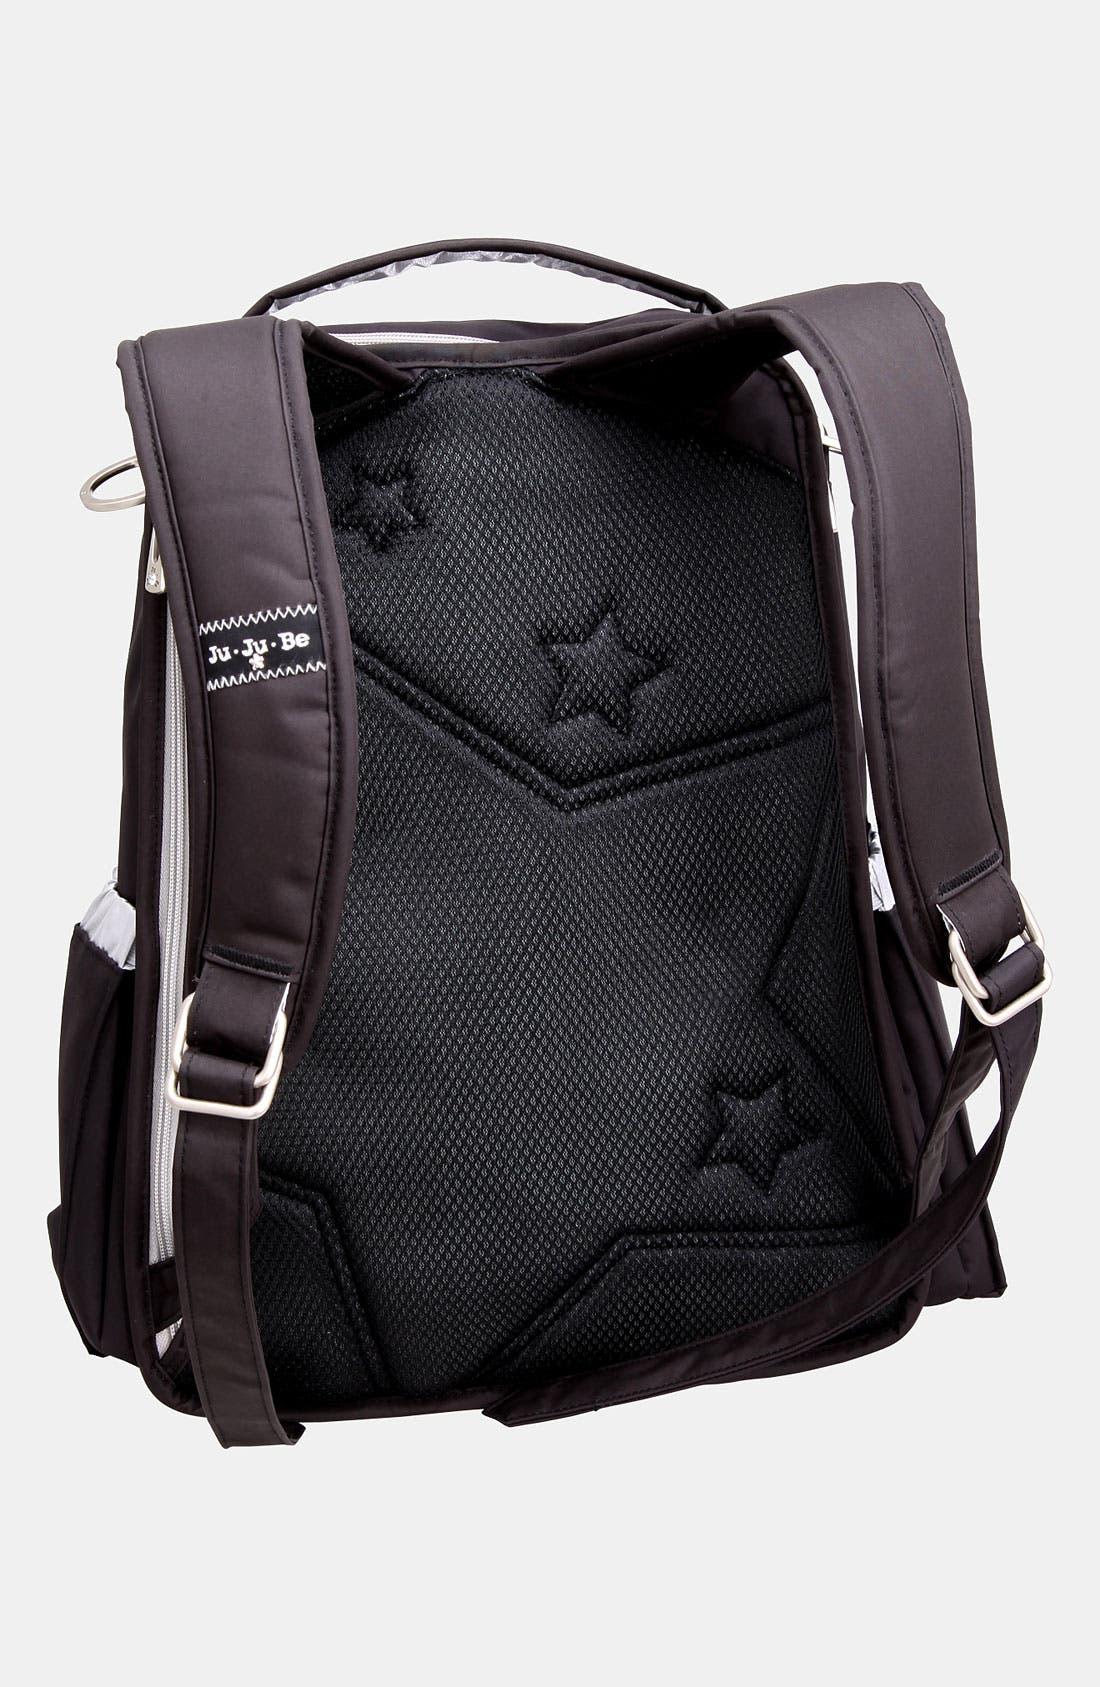 Alternate Image 3  - Ju-Ju-Be 'Be Right Back' Diaper Backpack